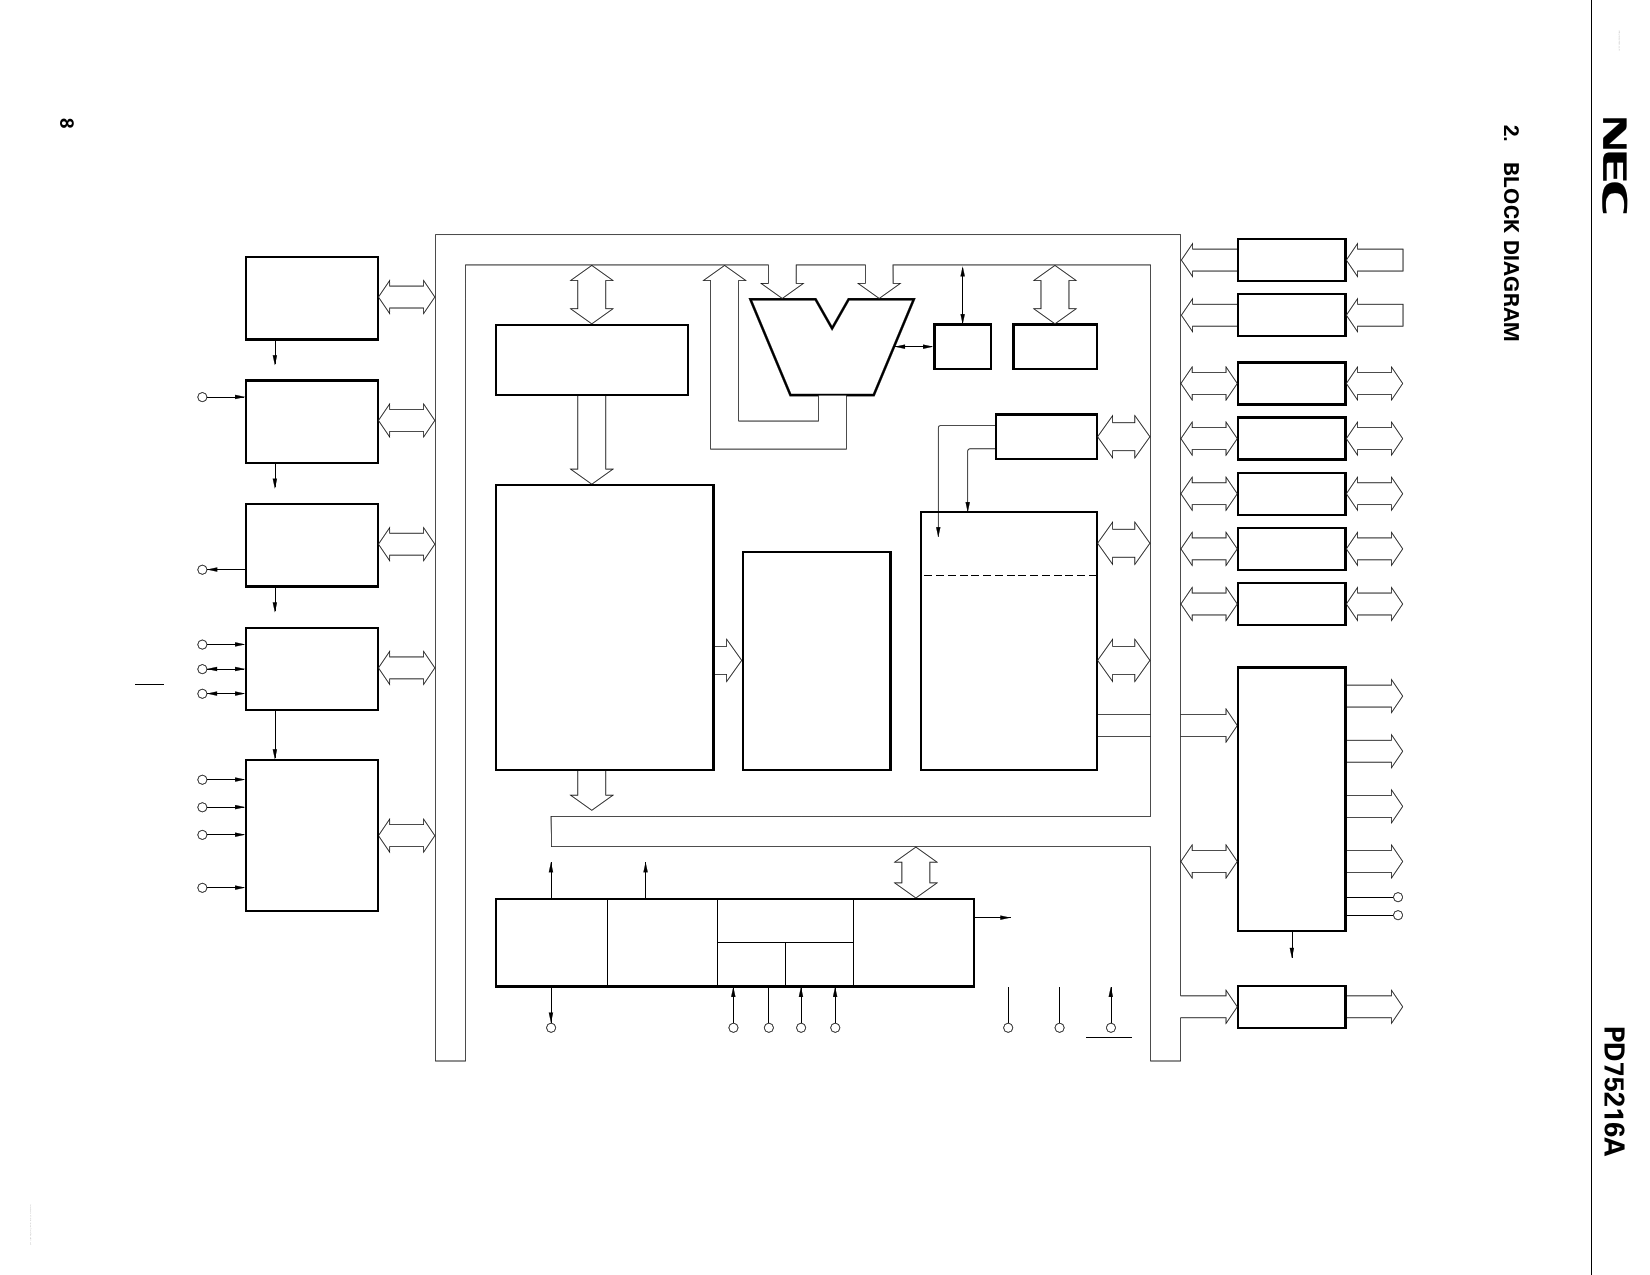 cw3853集成块电路图